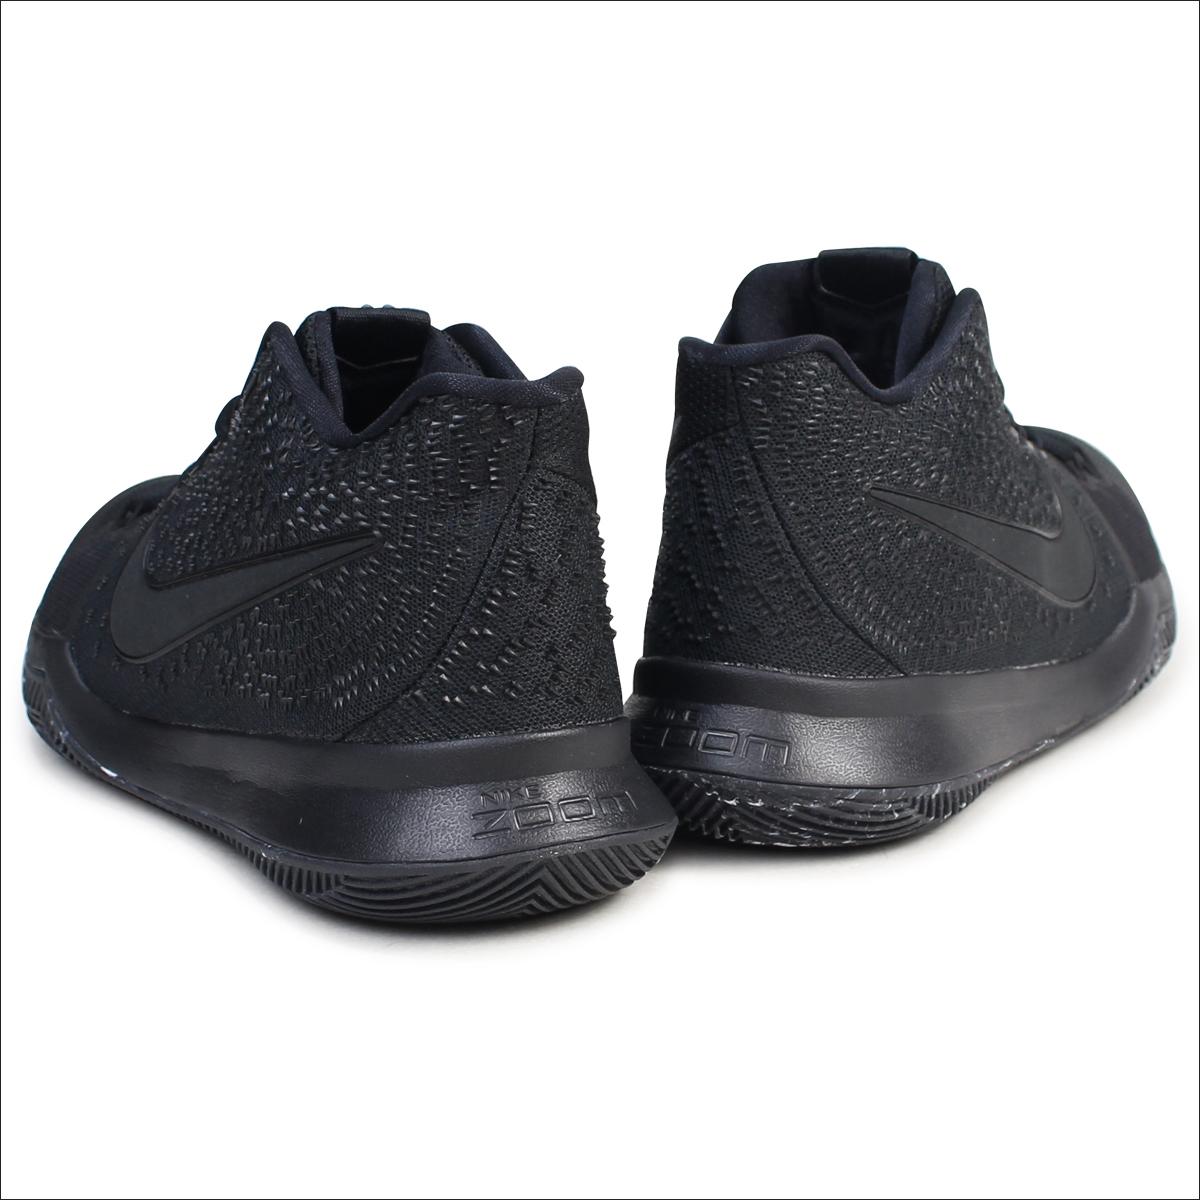 outlet store 94ef1 dec79 NIKE Nike chi Lee 3 sneakers NIKE KYRIE 3 EP TRIPLE BLACK 852,396-005 chi  Lee Irving men shoes black